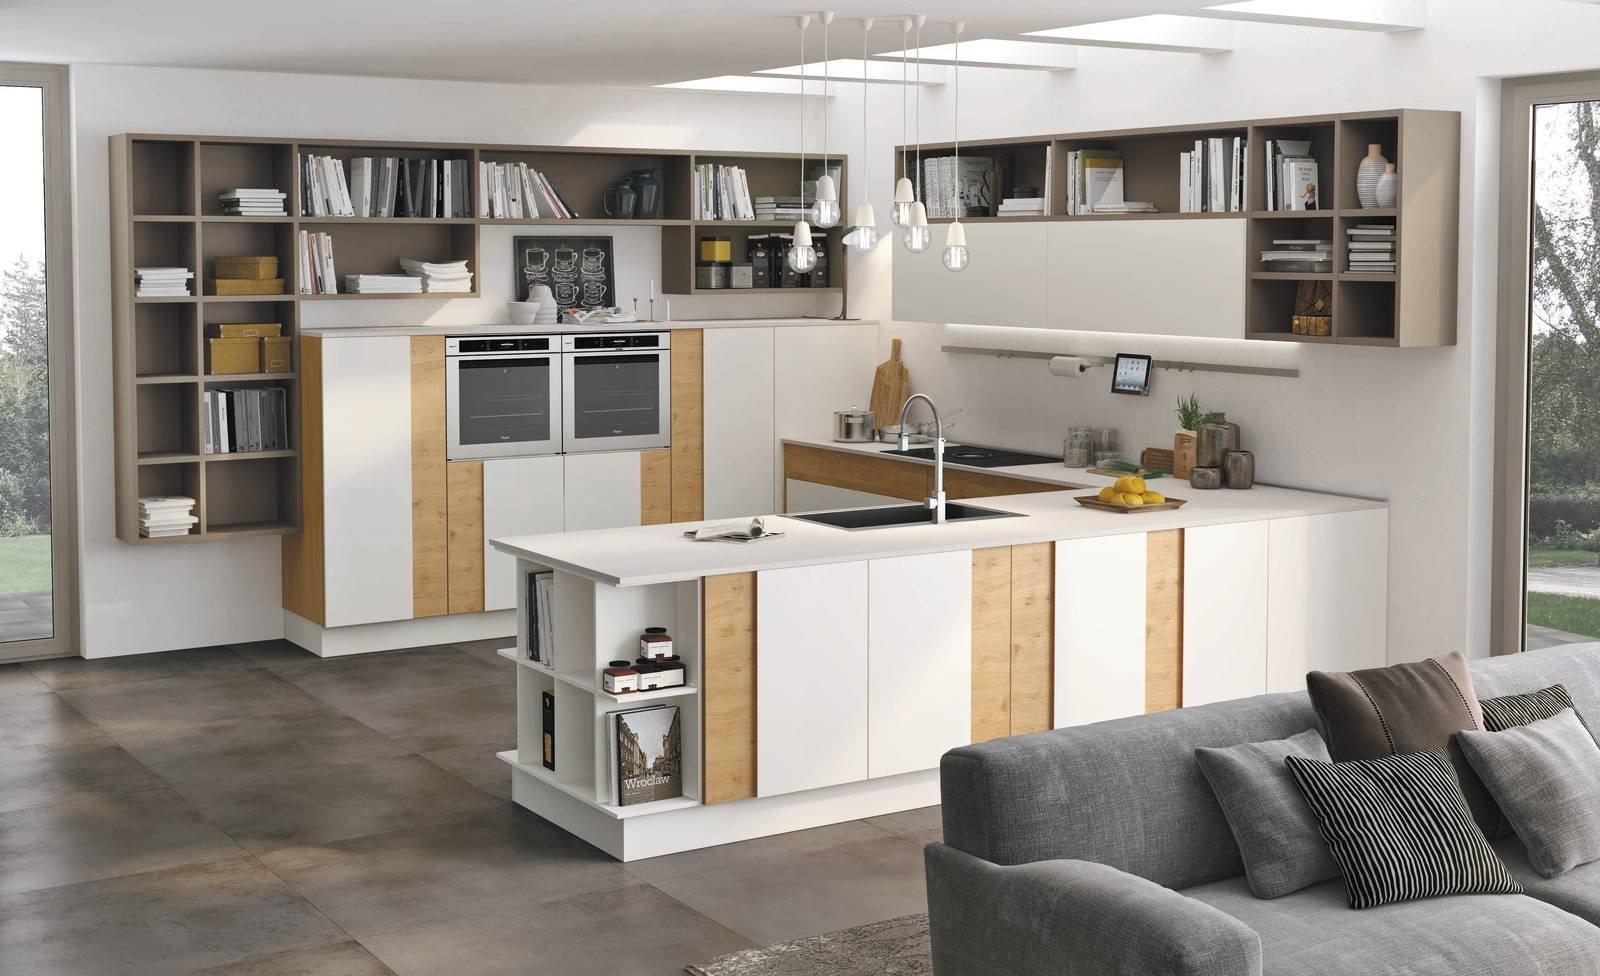 Ante cucina legno cheap tiarchcom ante cucina legno - Colorare ante cucina ...